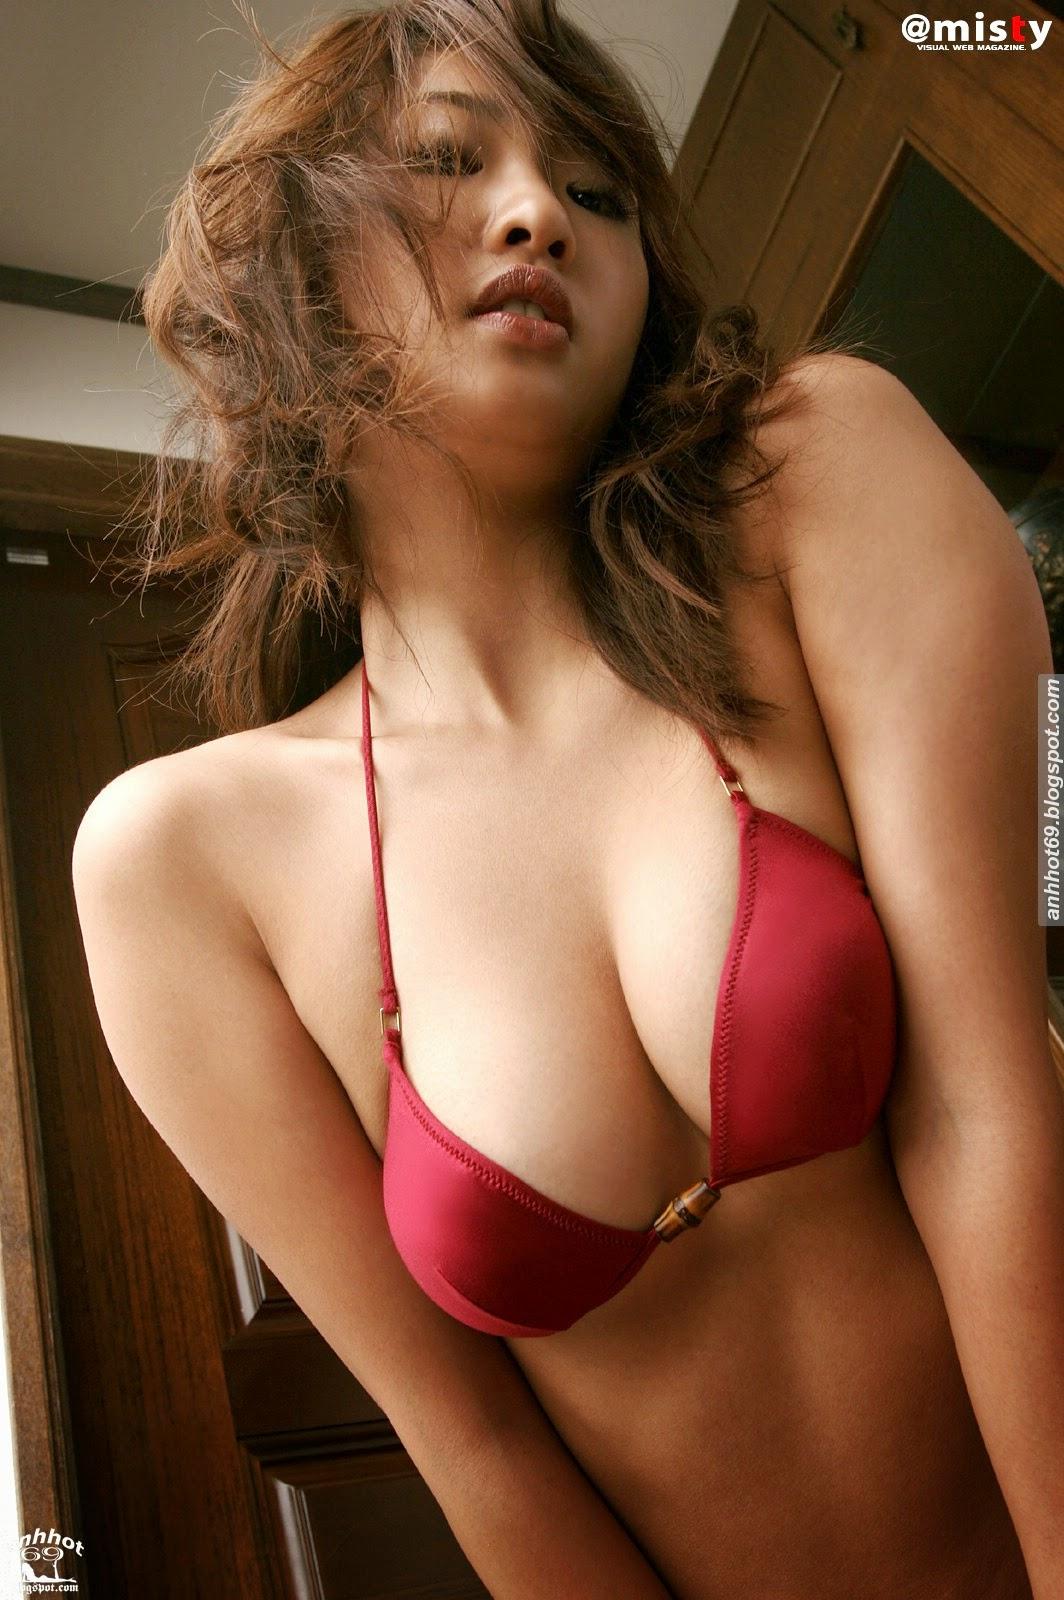 sayaka-ando-02013496